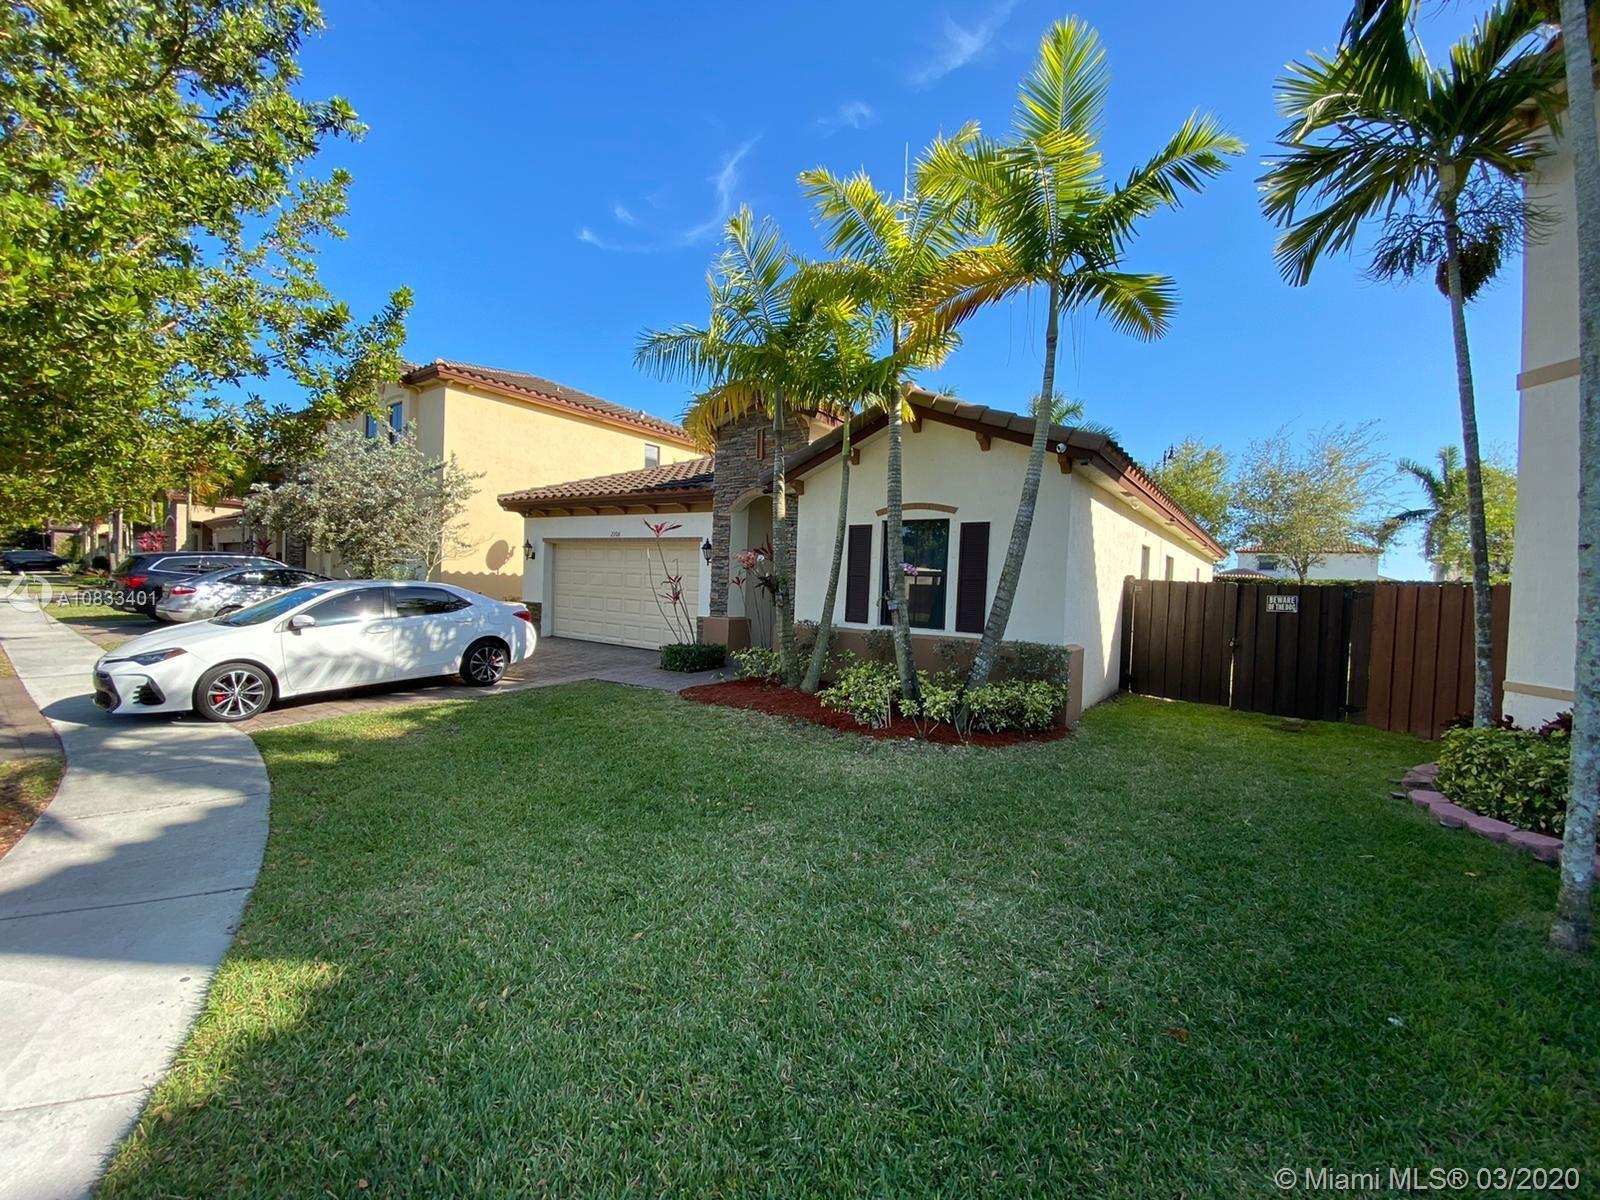 2706 NE 1st St, Homestead, FL 33033 - Homestead, FL real estate listing